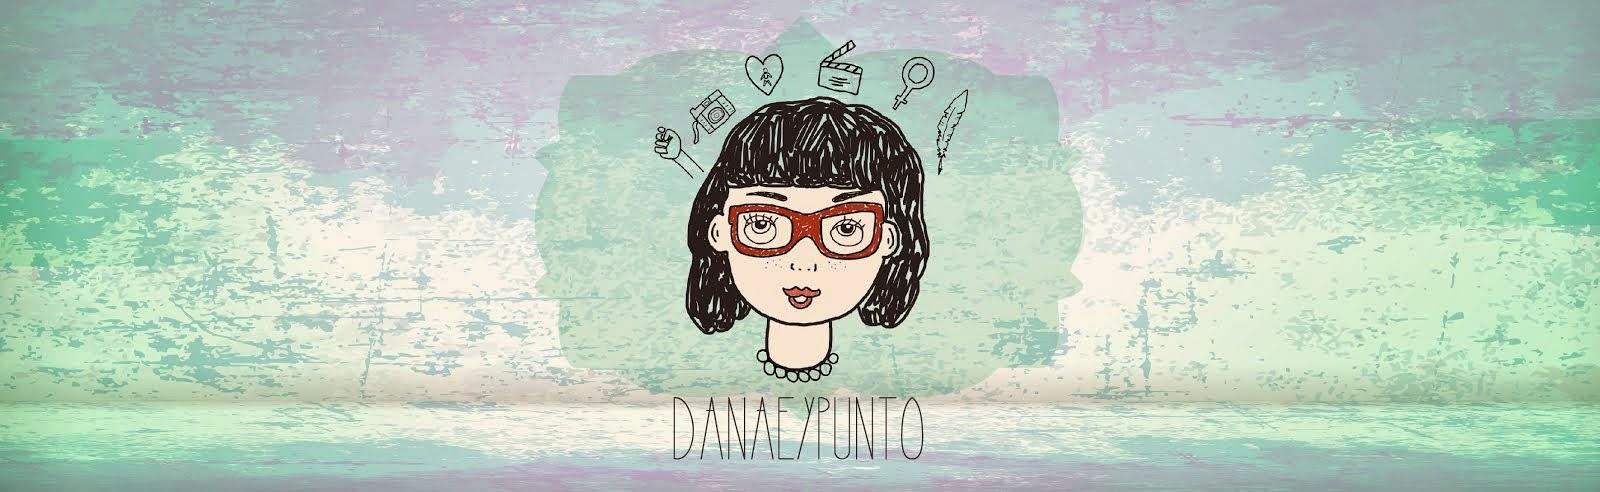 Danaeypunto